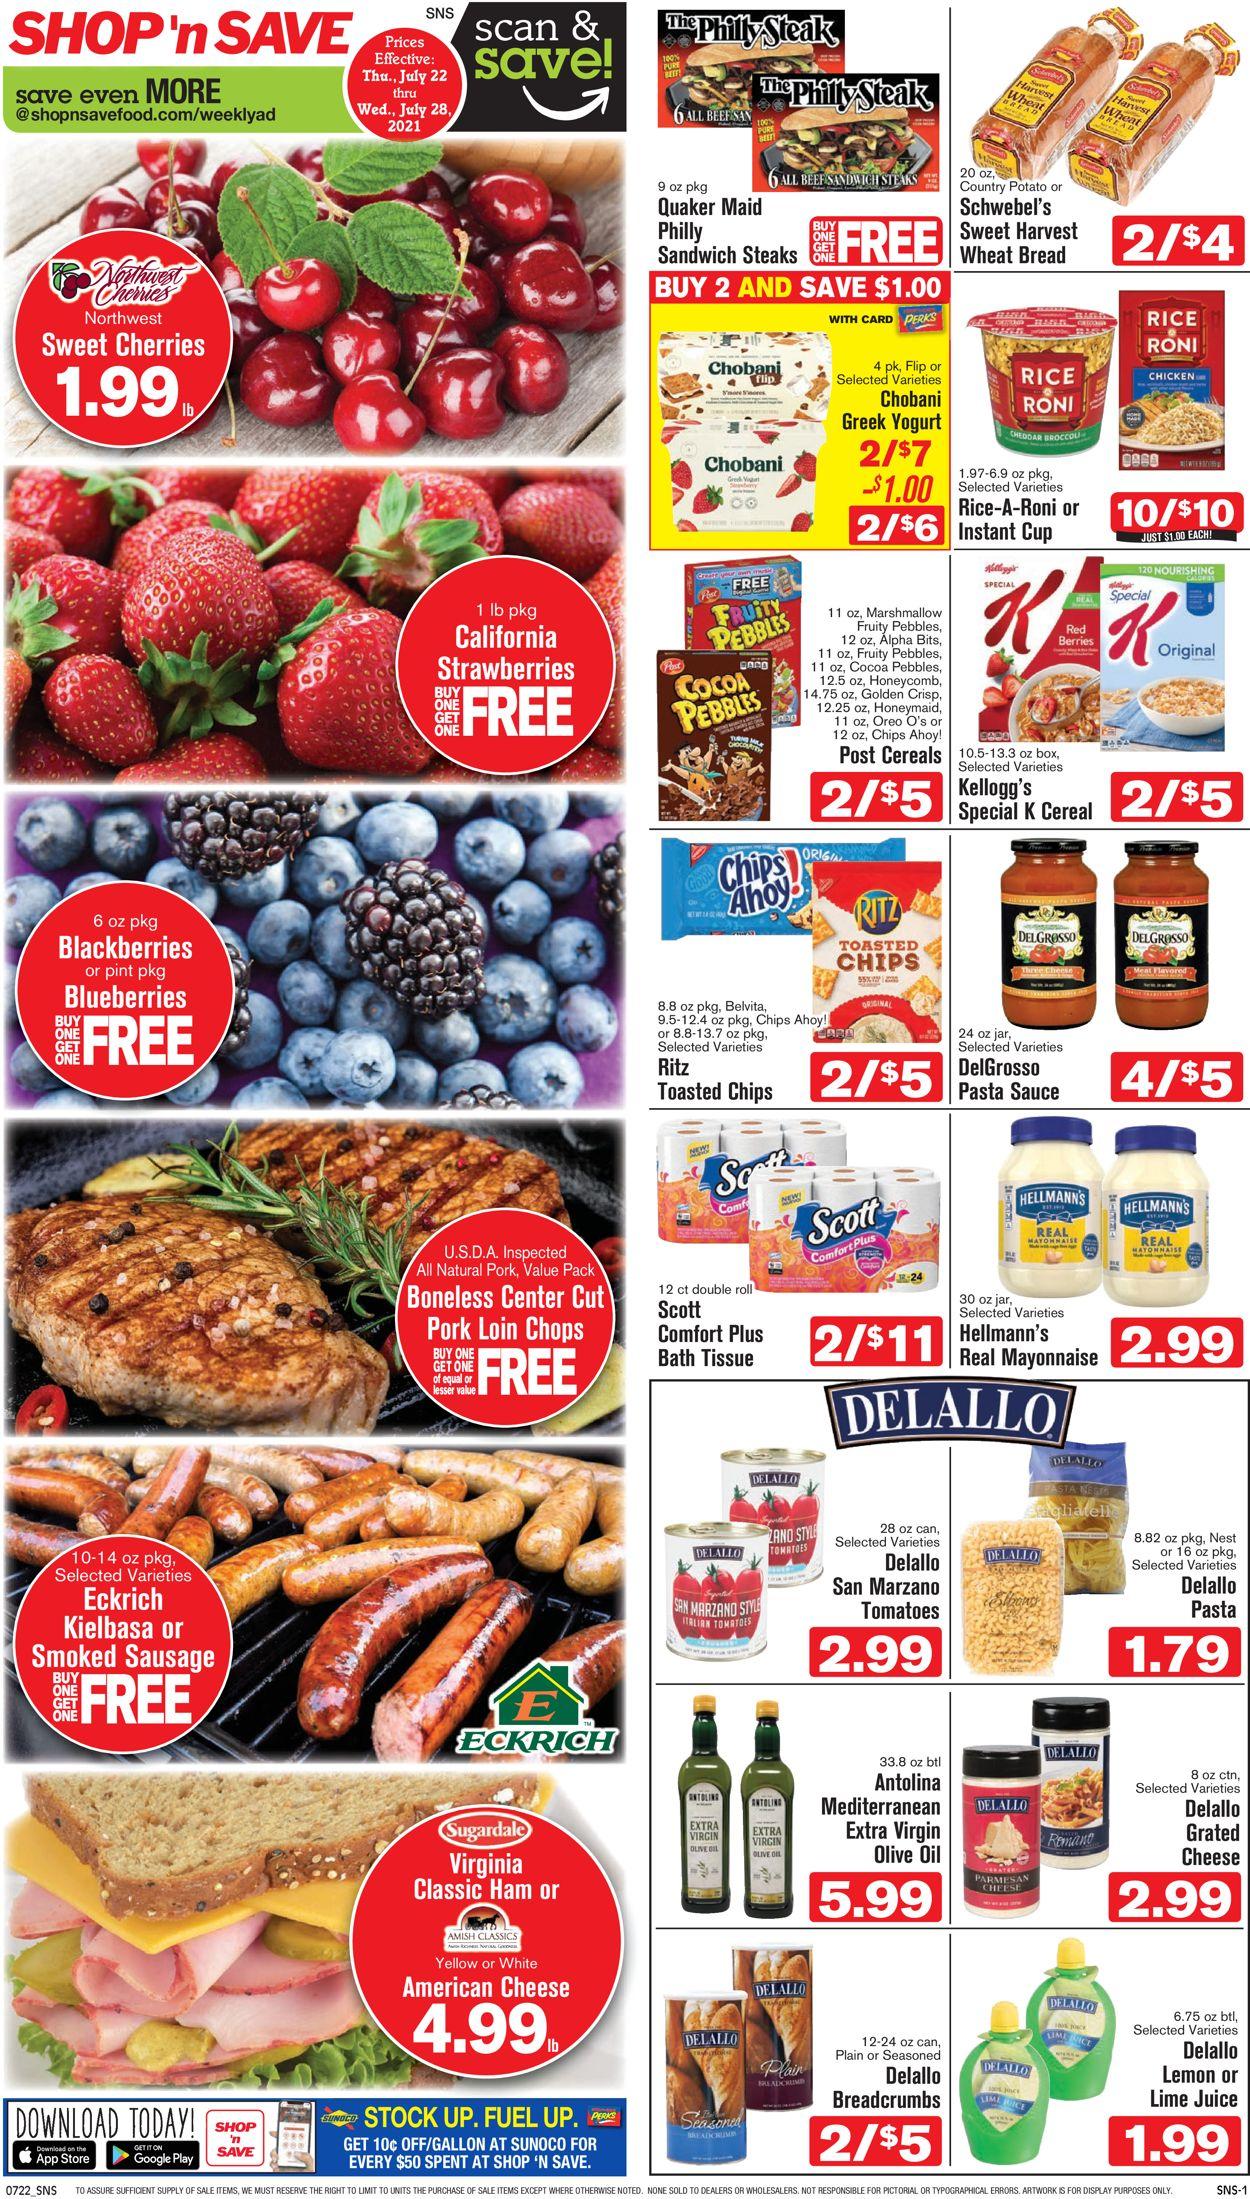 Shop 'n Save Weekly Ad Circular - valid 07/22-07/28/2021